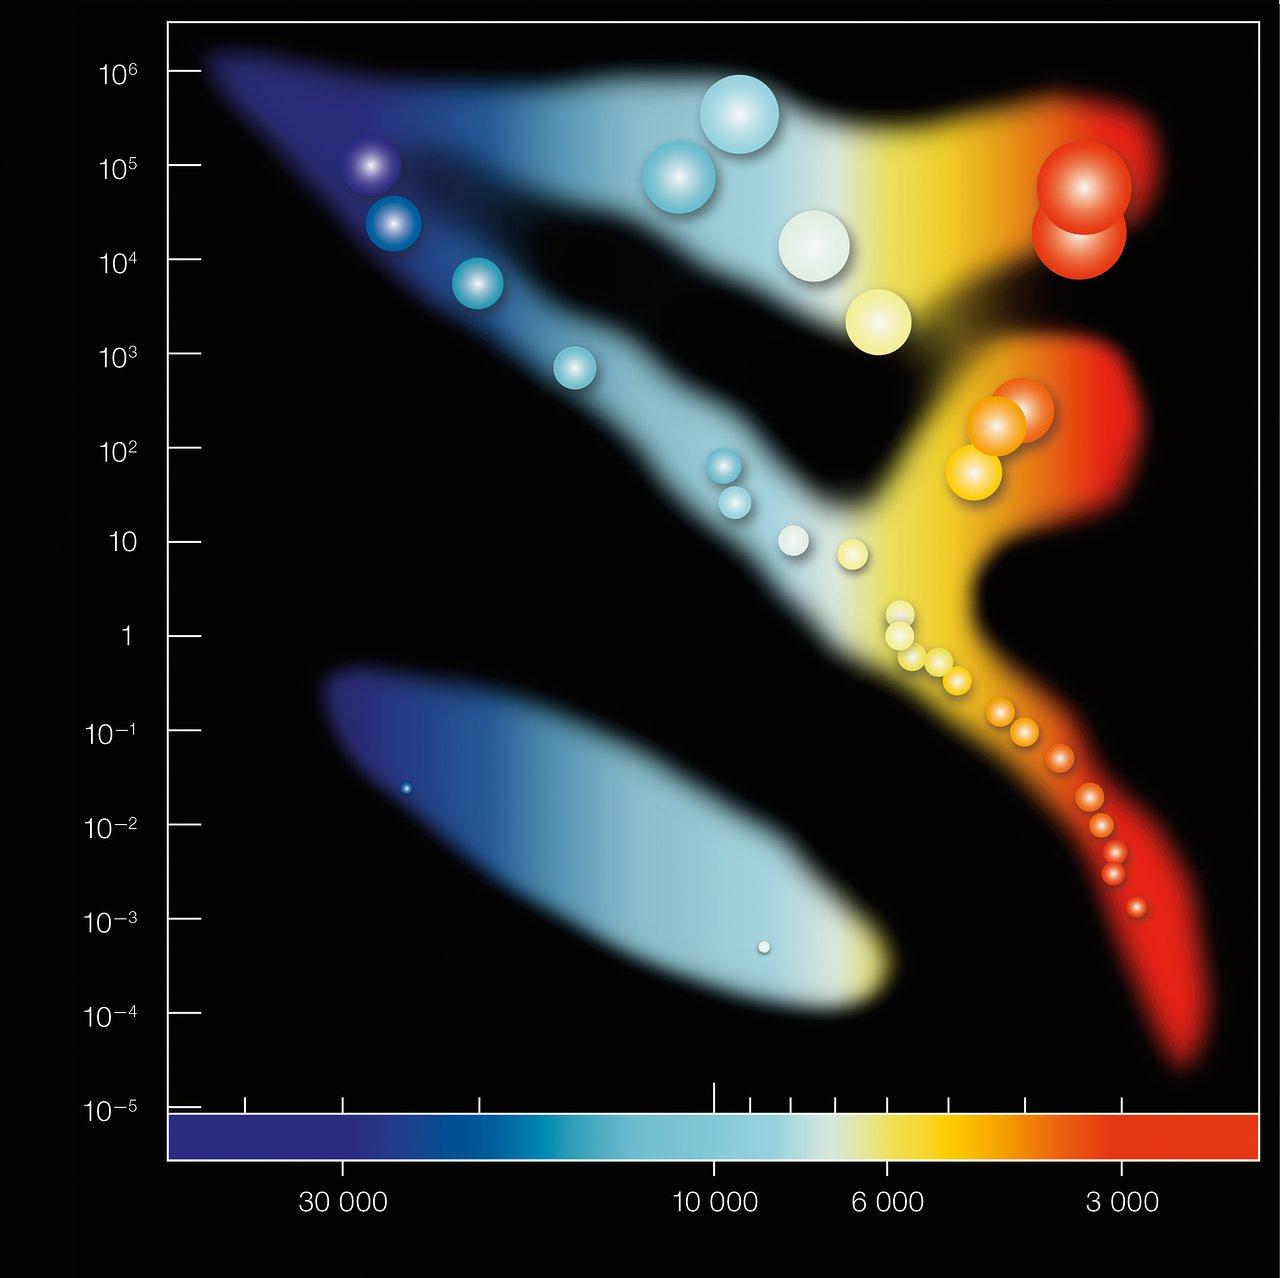 Hertzsprung-Russell Diagram (unannotated)